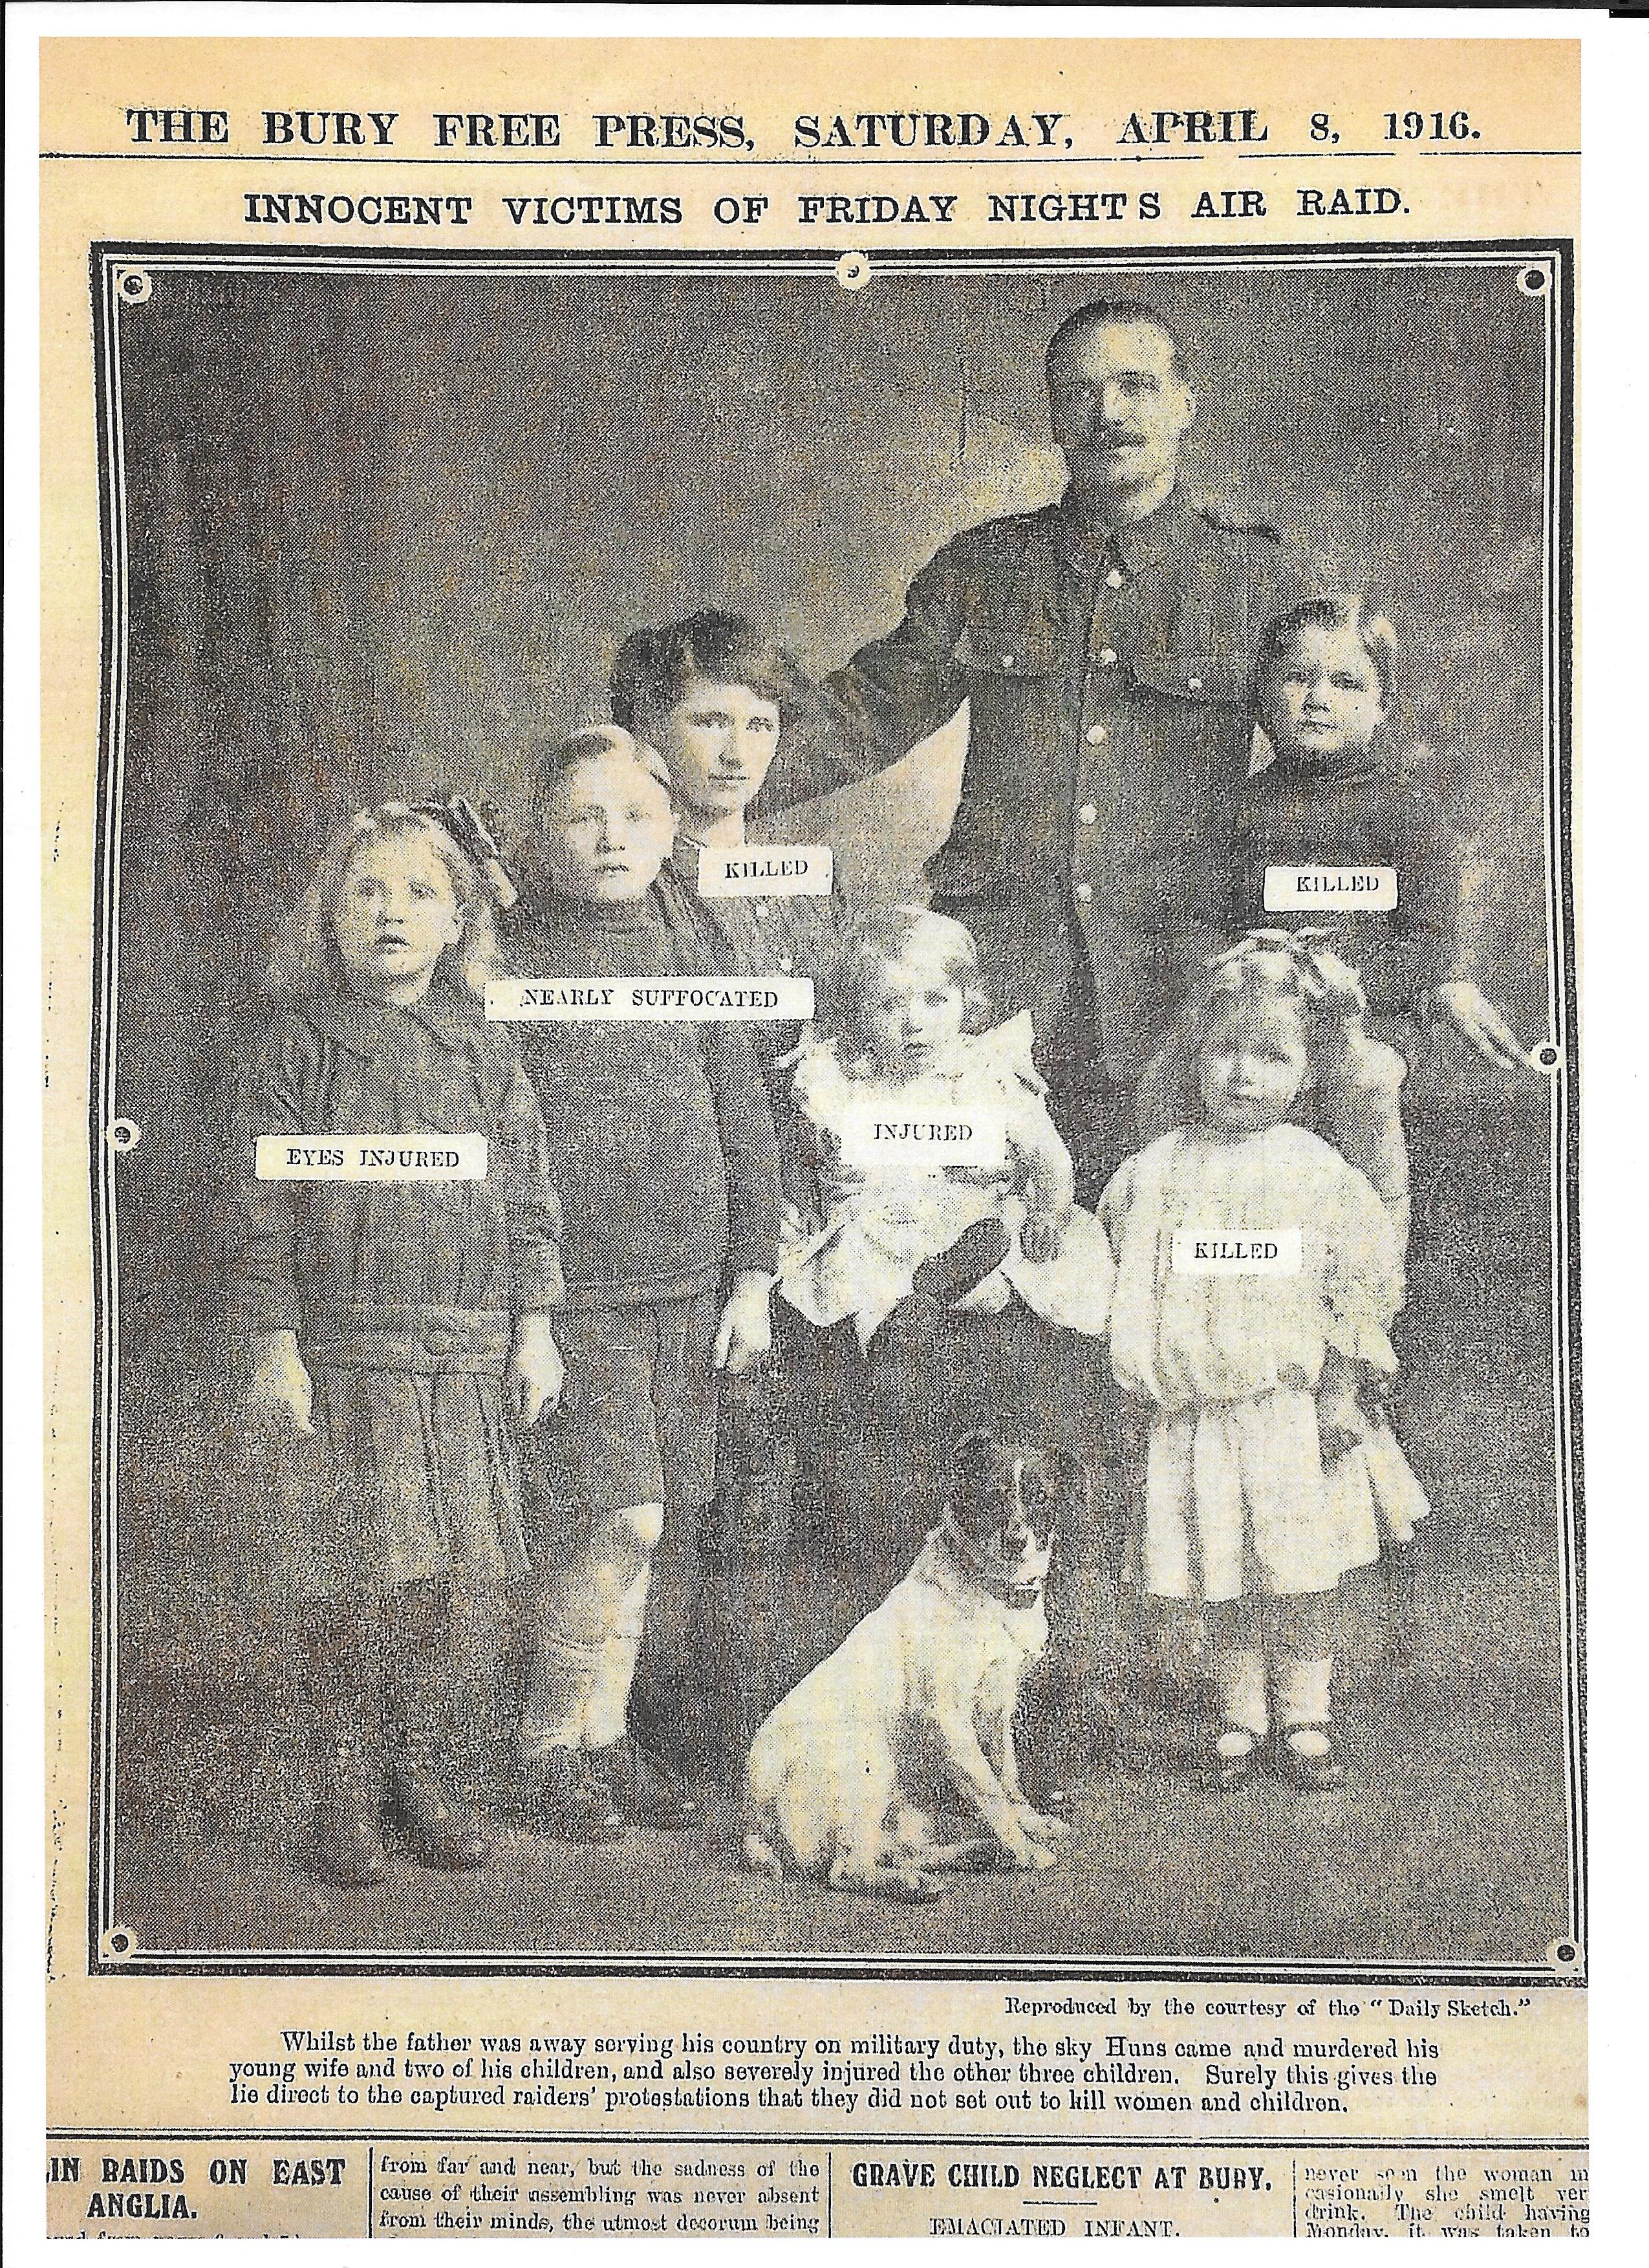 Dureall family, c,1916